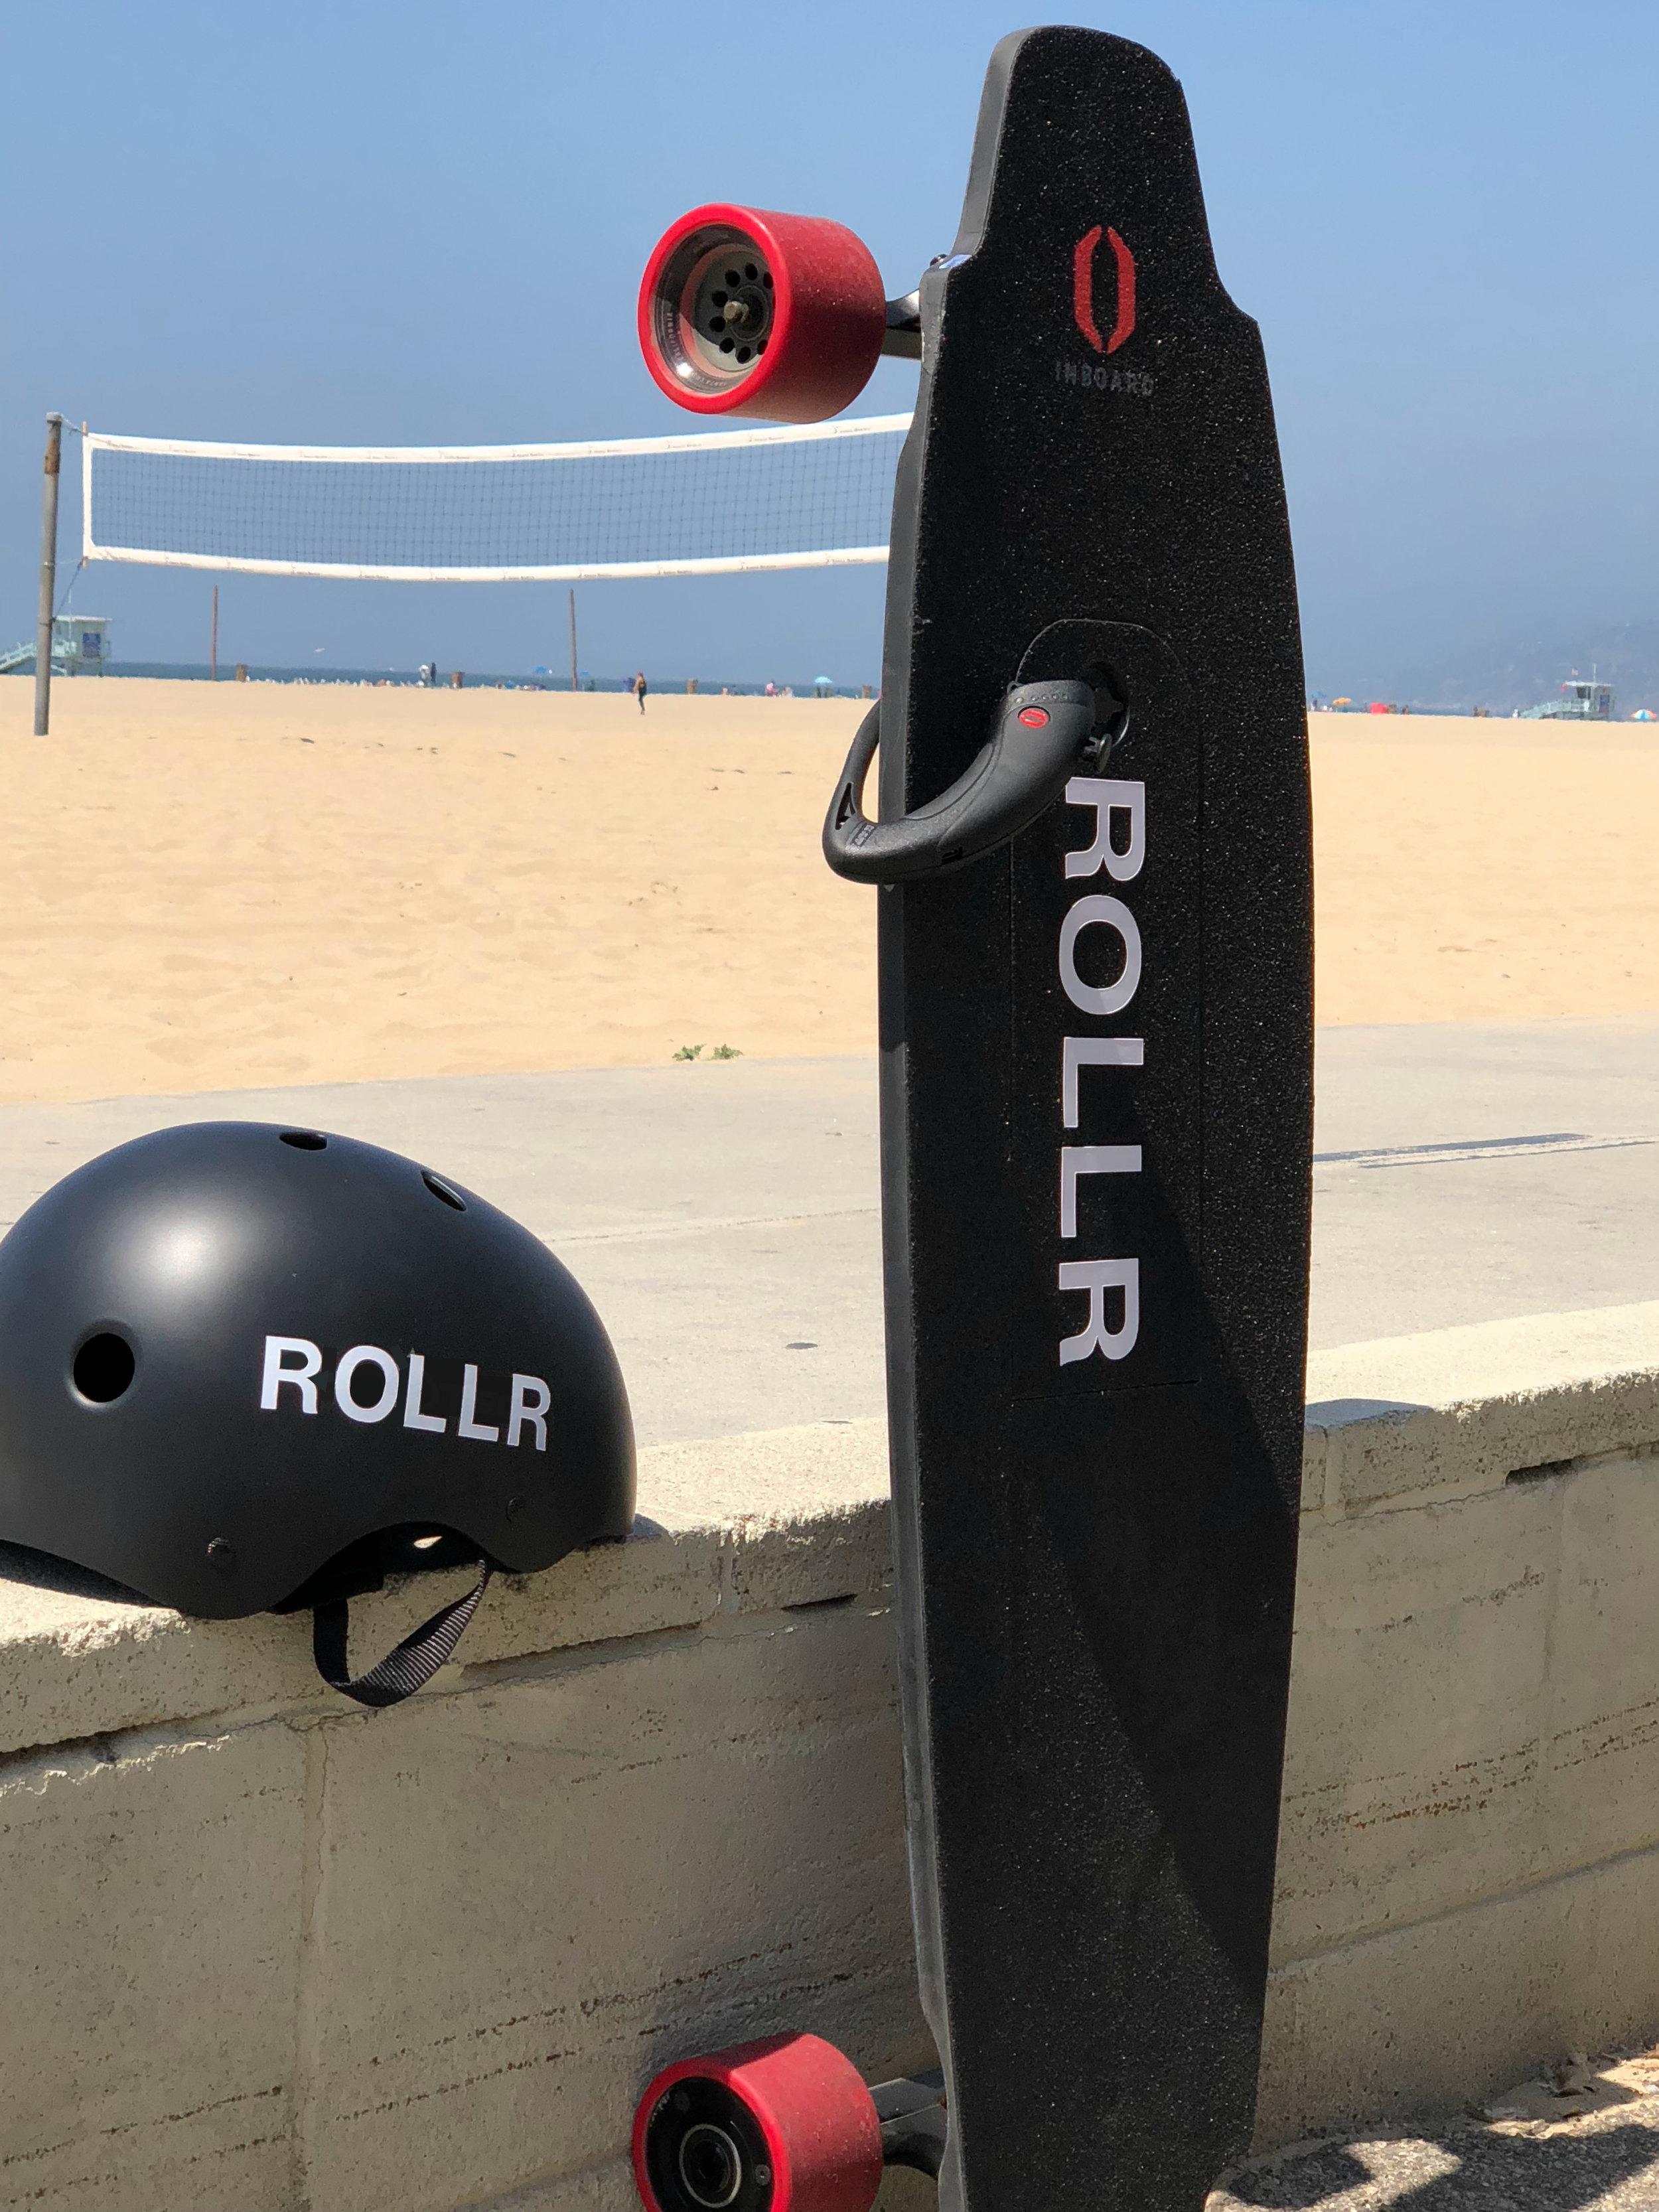 rollr-app-electric-skateboard-rental-venice-beach.jpg